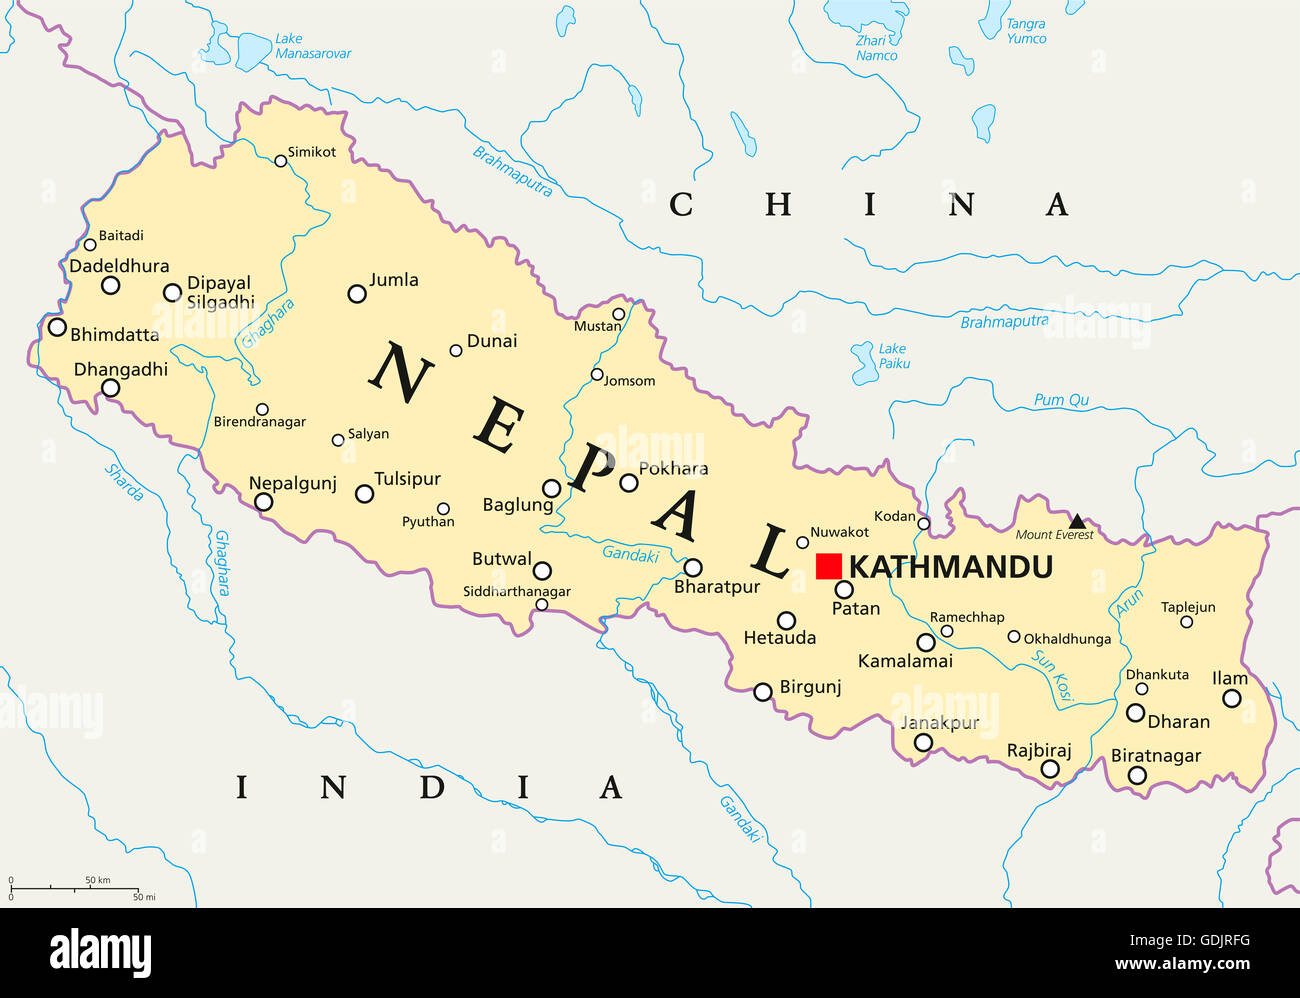 Nepal political map with capital Kathmandu national borders cities